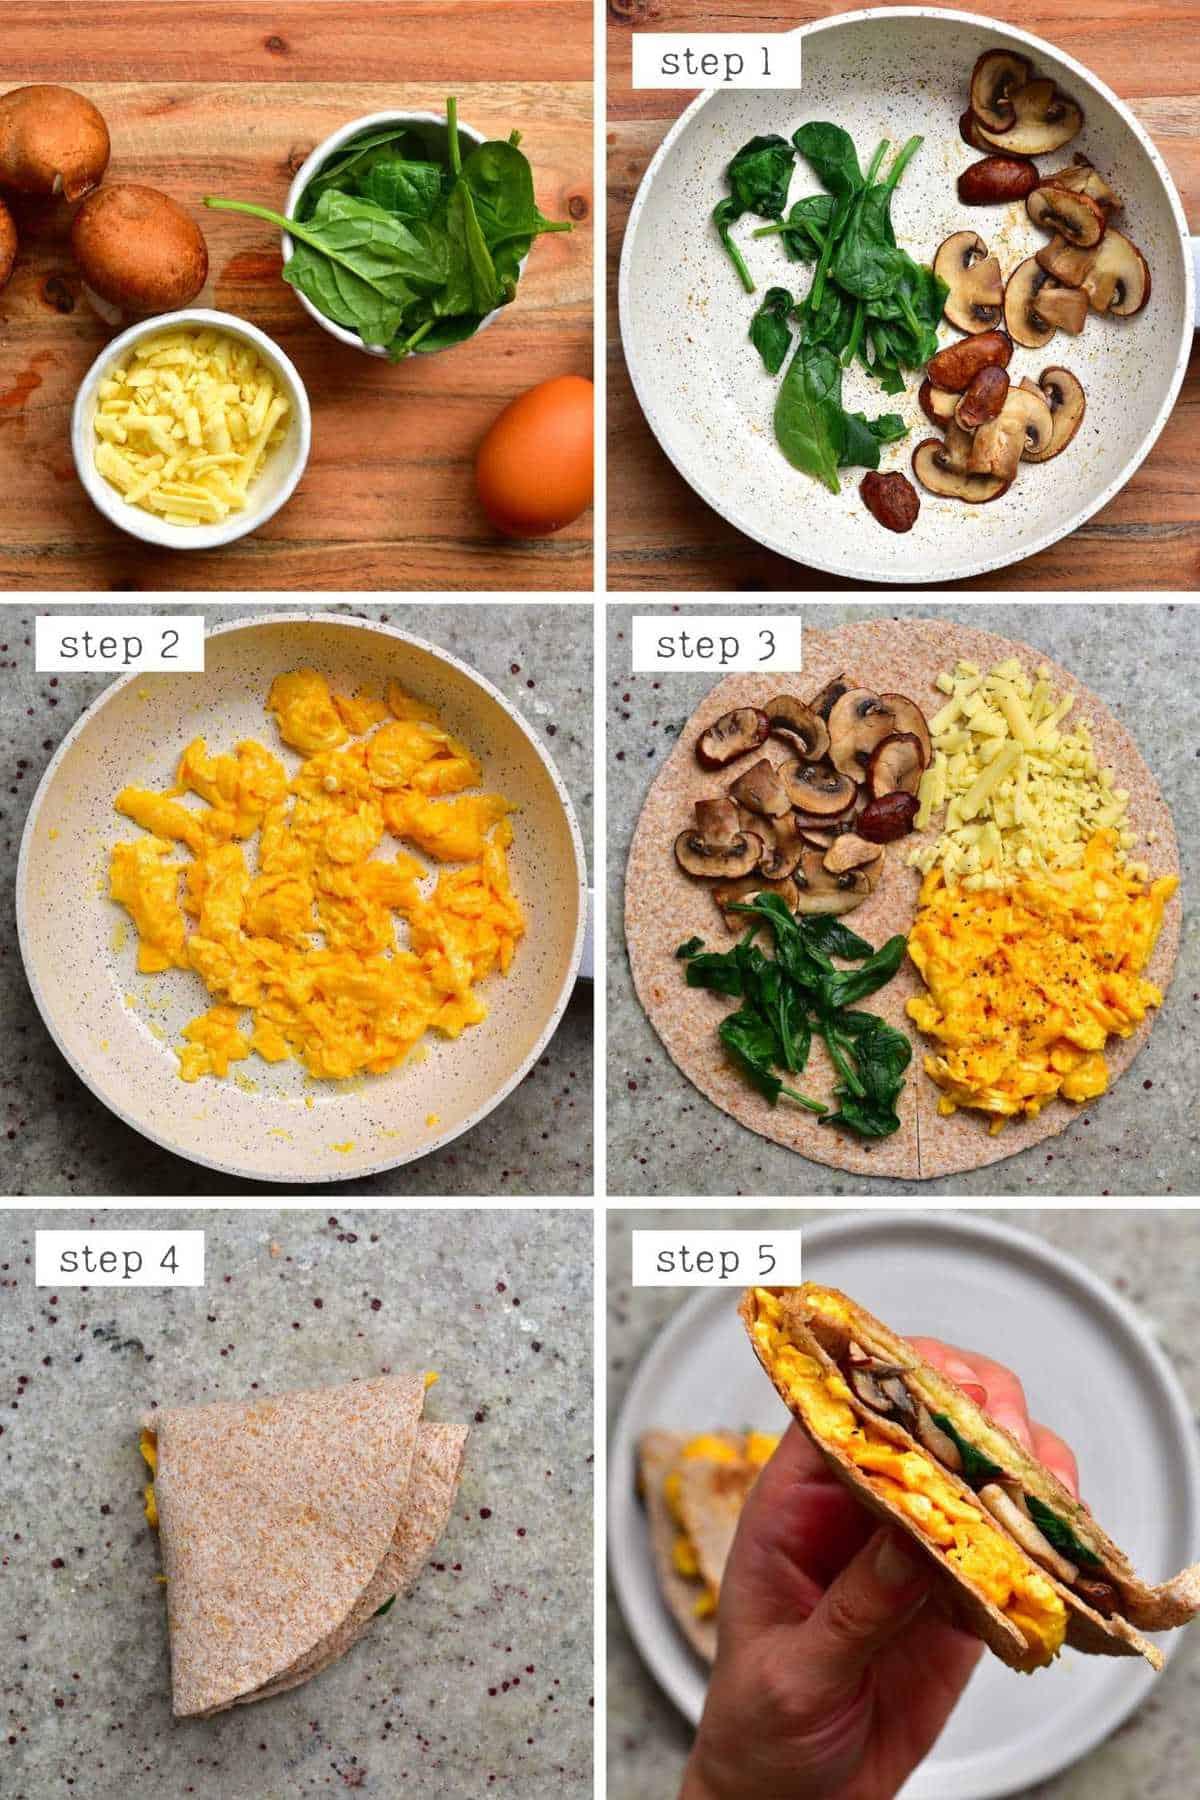 Steps for making a mushroom scrambled eggs breakfast wrap